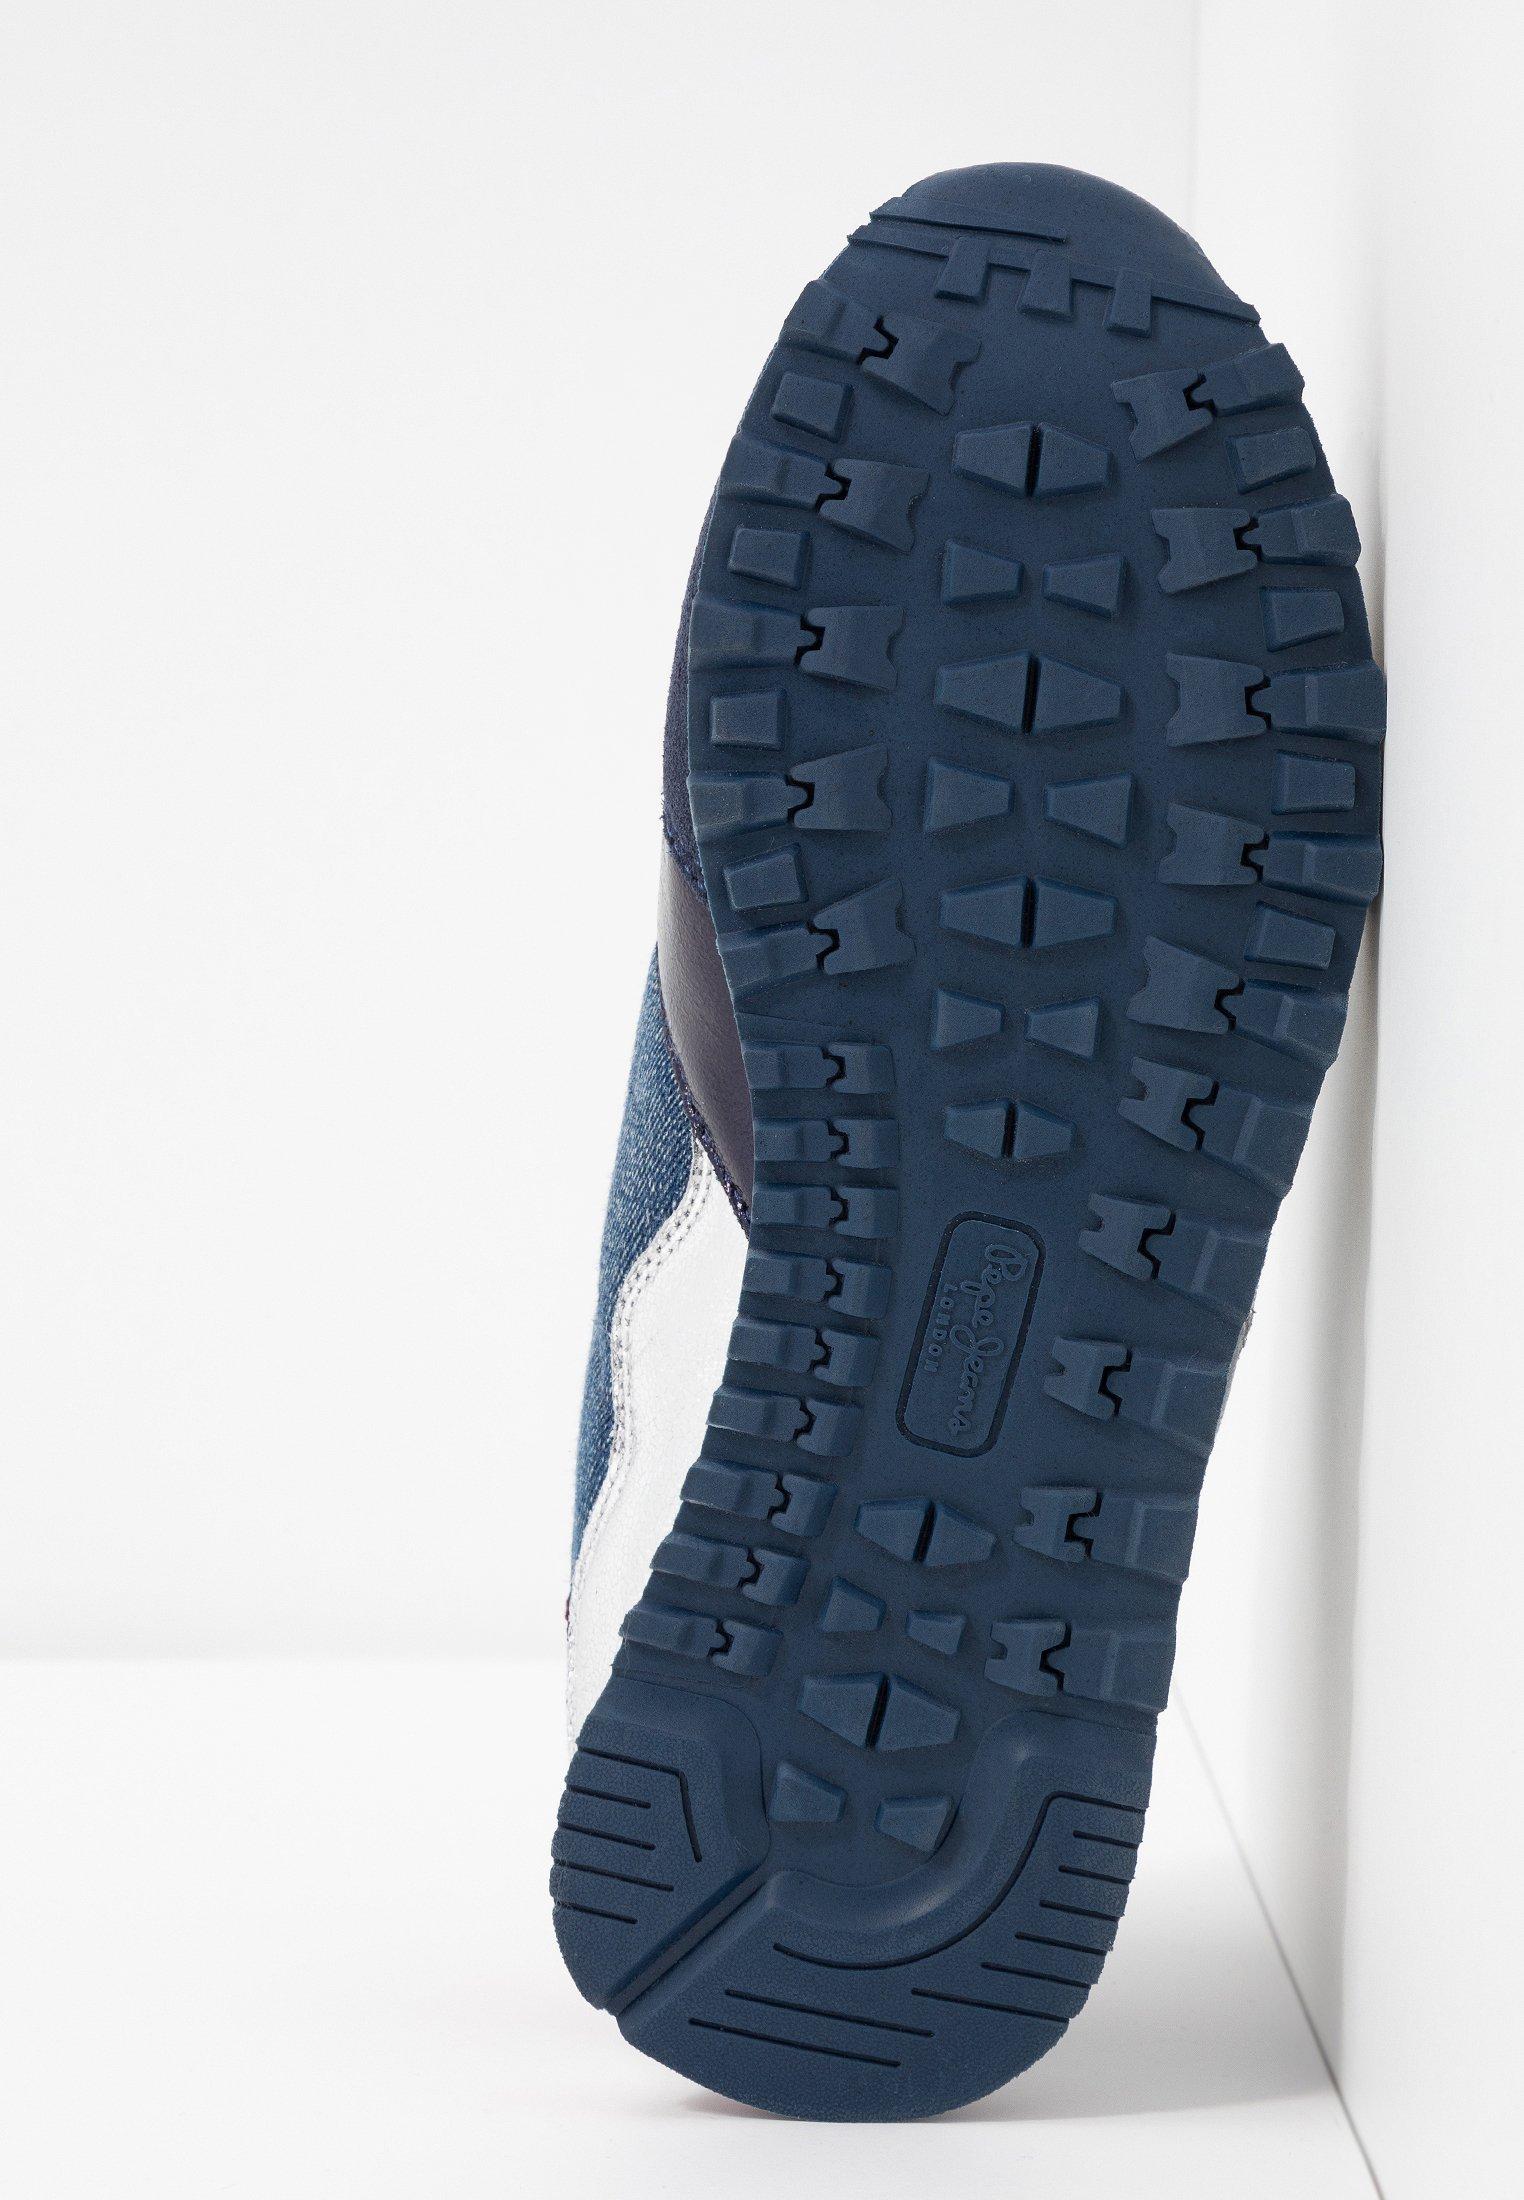 Basses Navy Jeans Verona FrayBaskets Pepe rCxBdeo